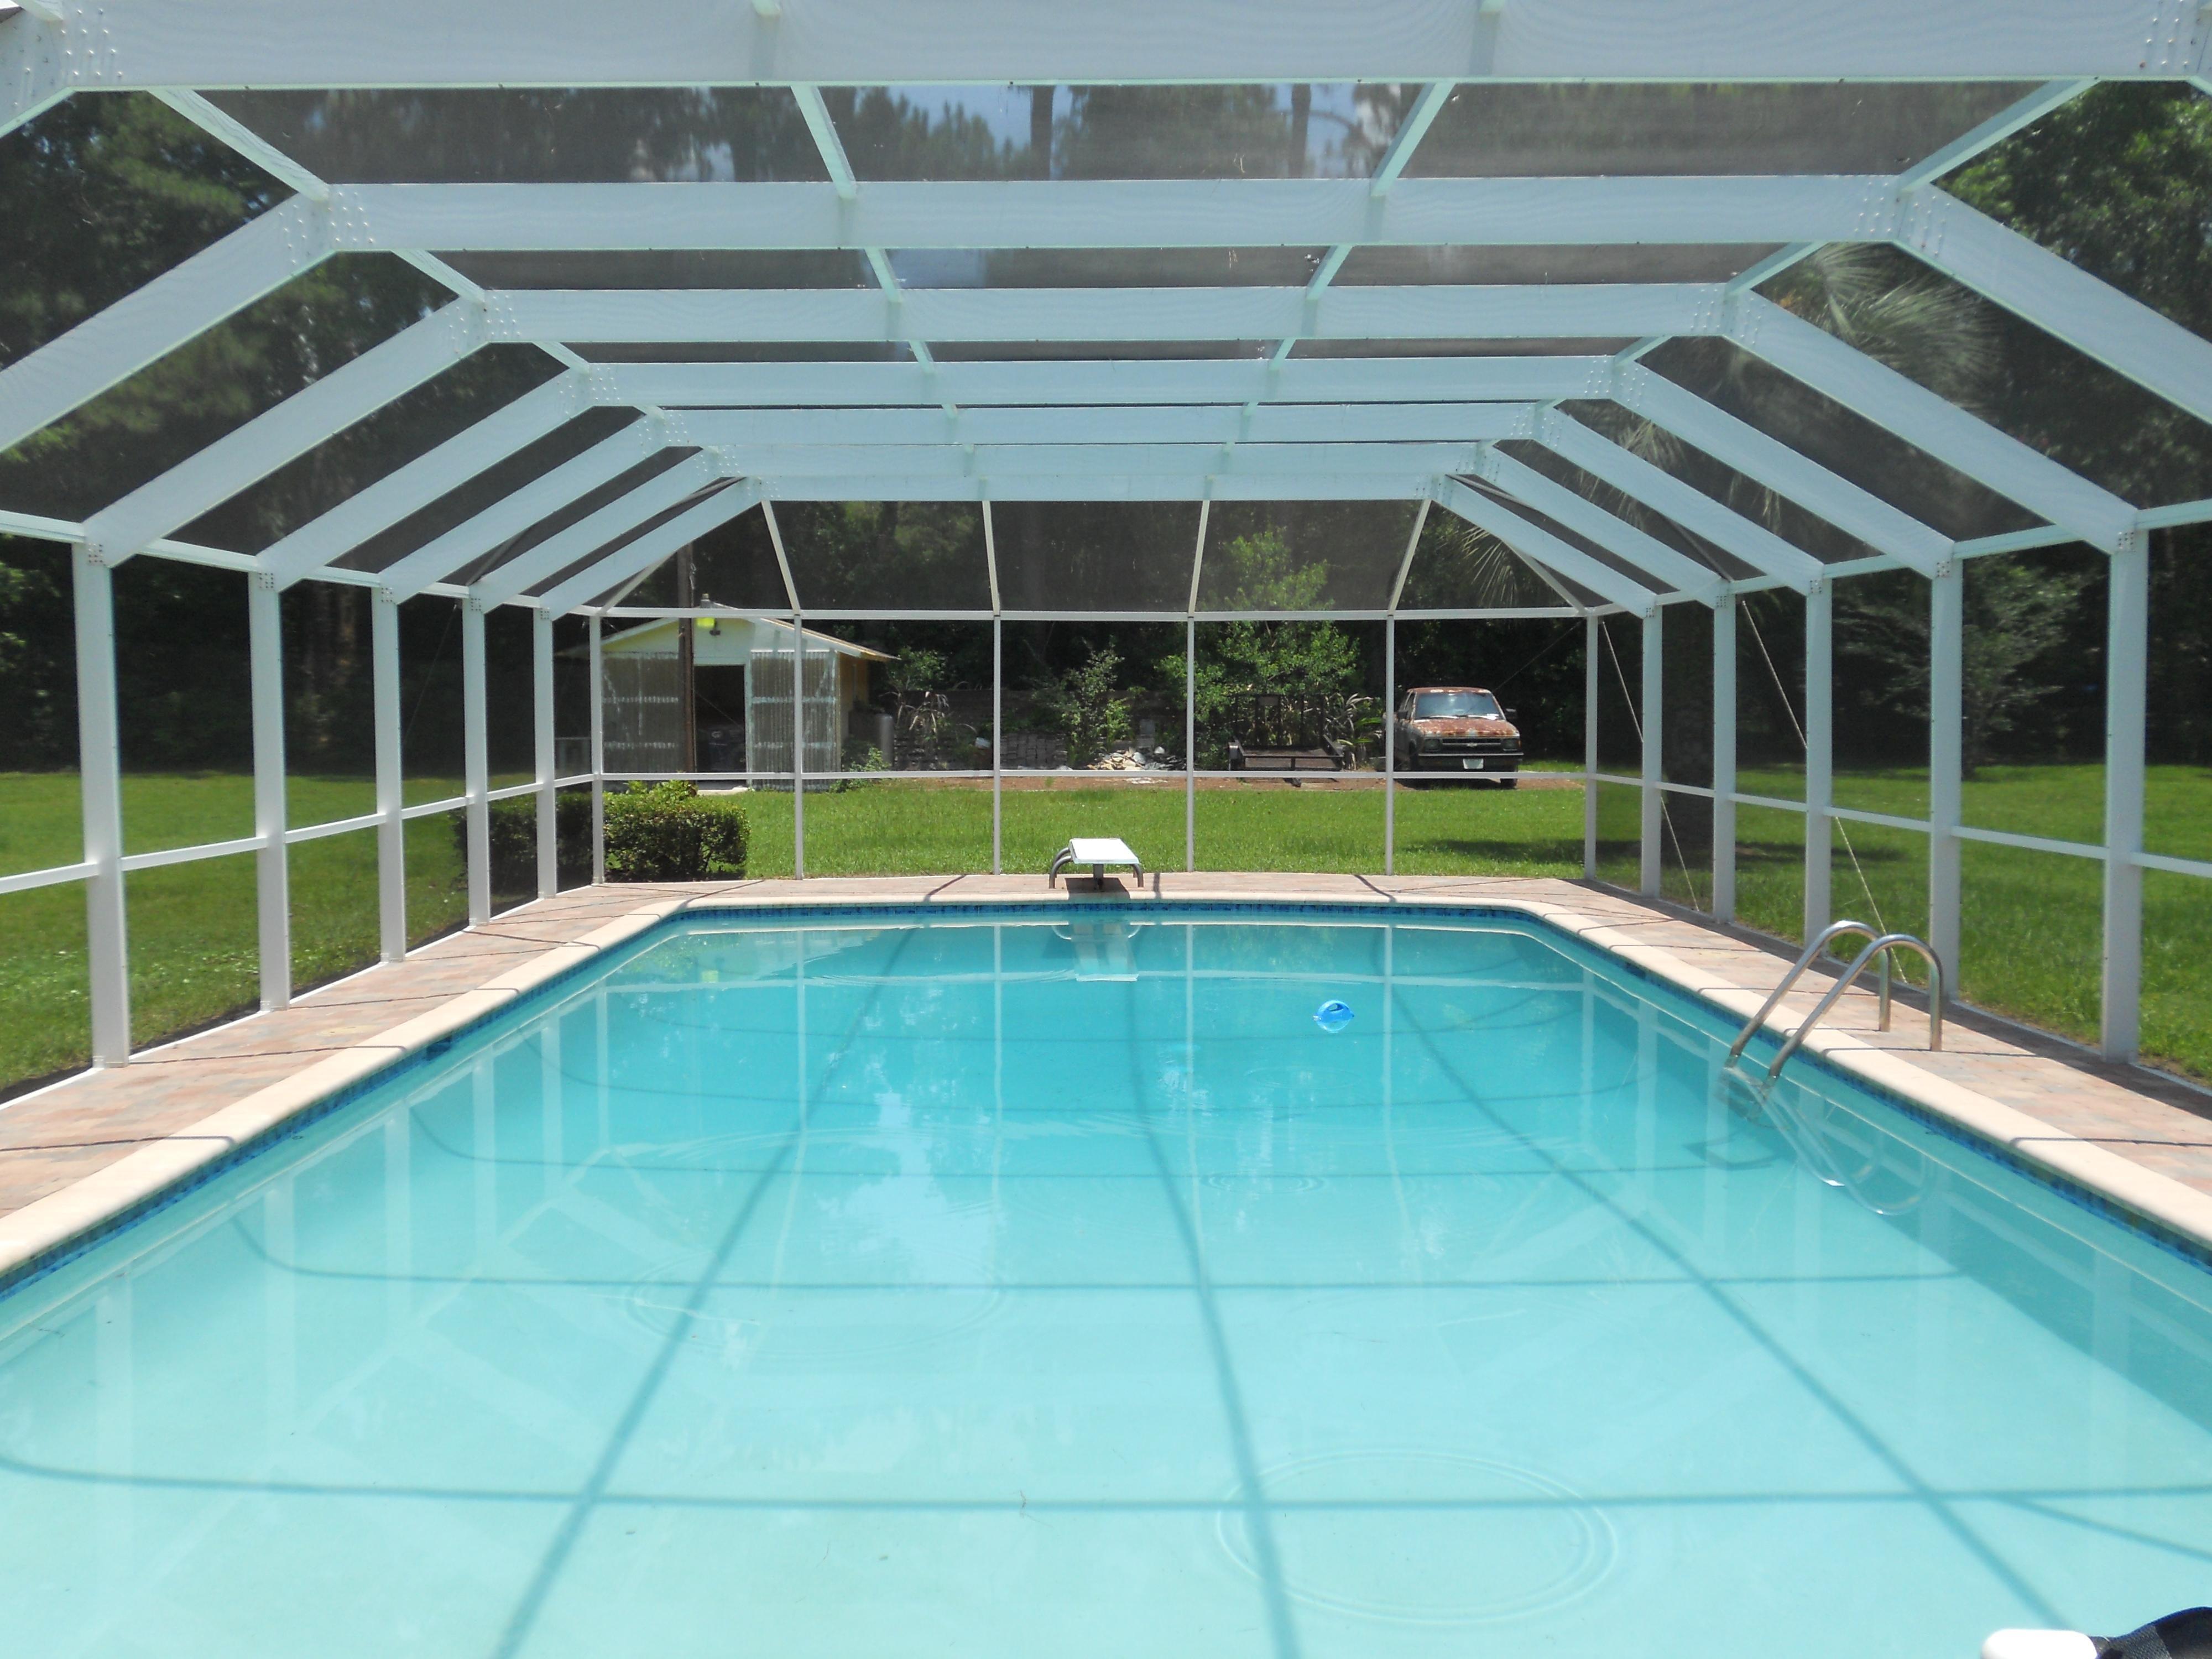 Swimming Pool Pressure Washing : Nubirth pressure washing ontario st jacksonville fl